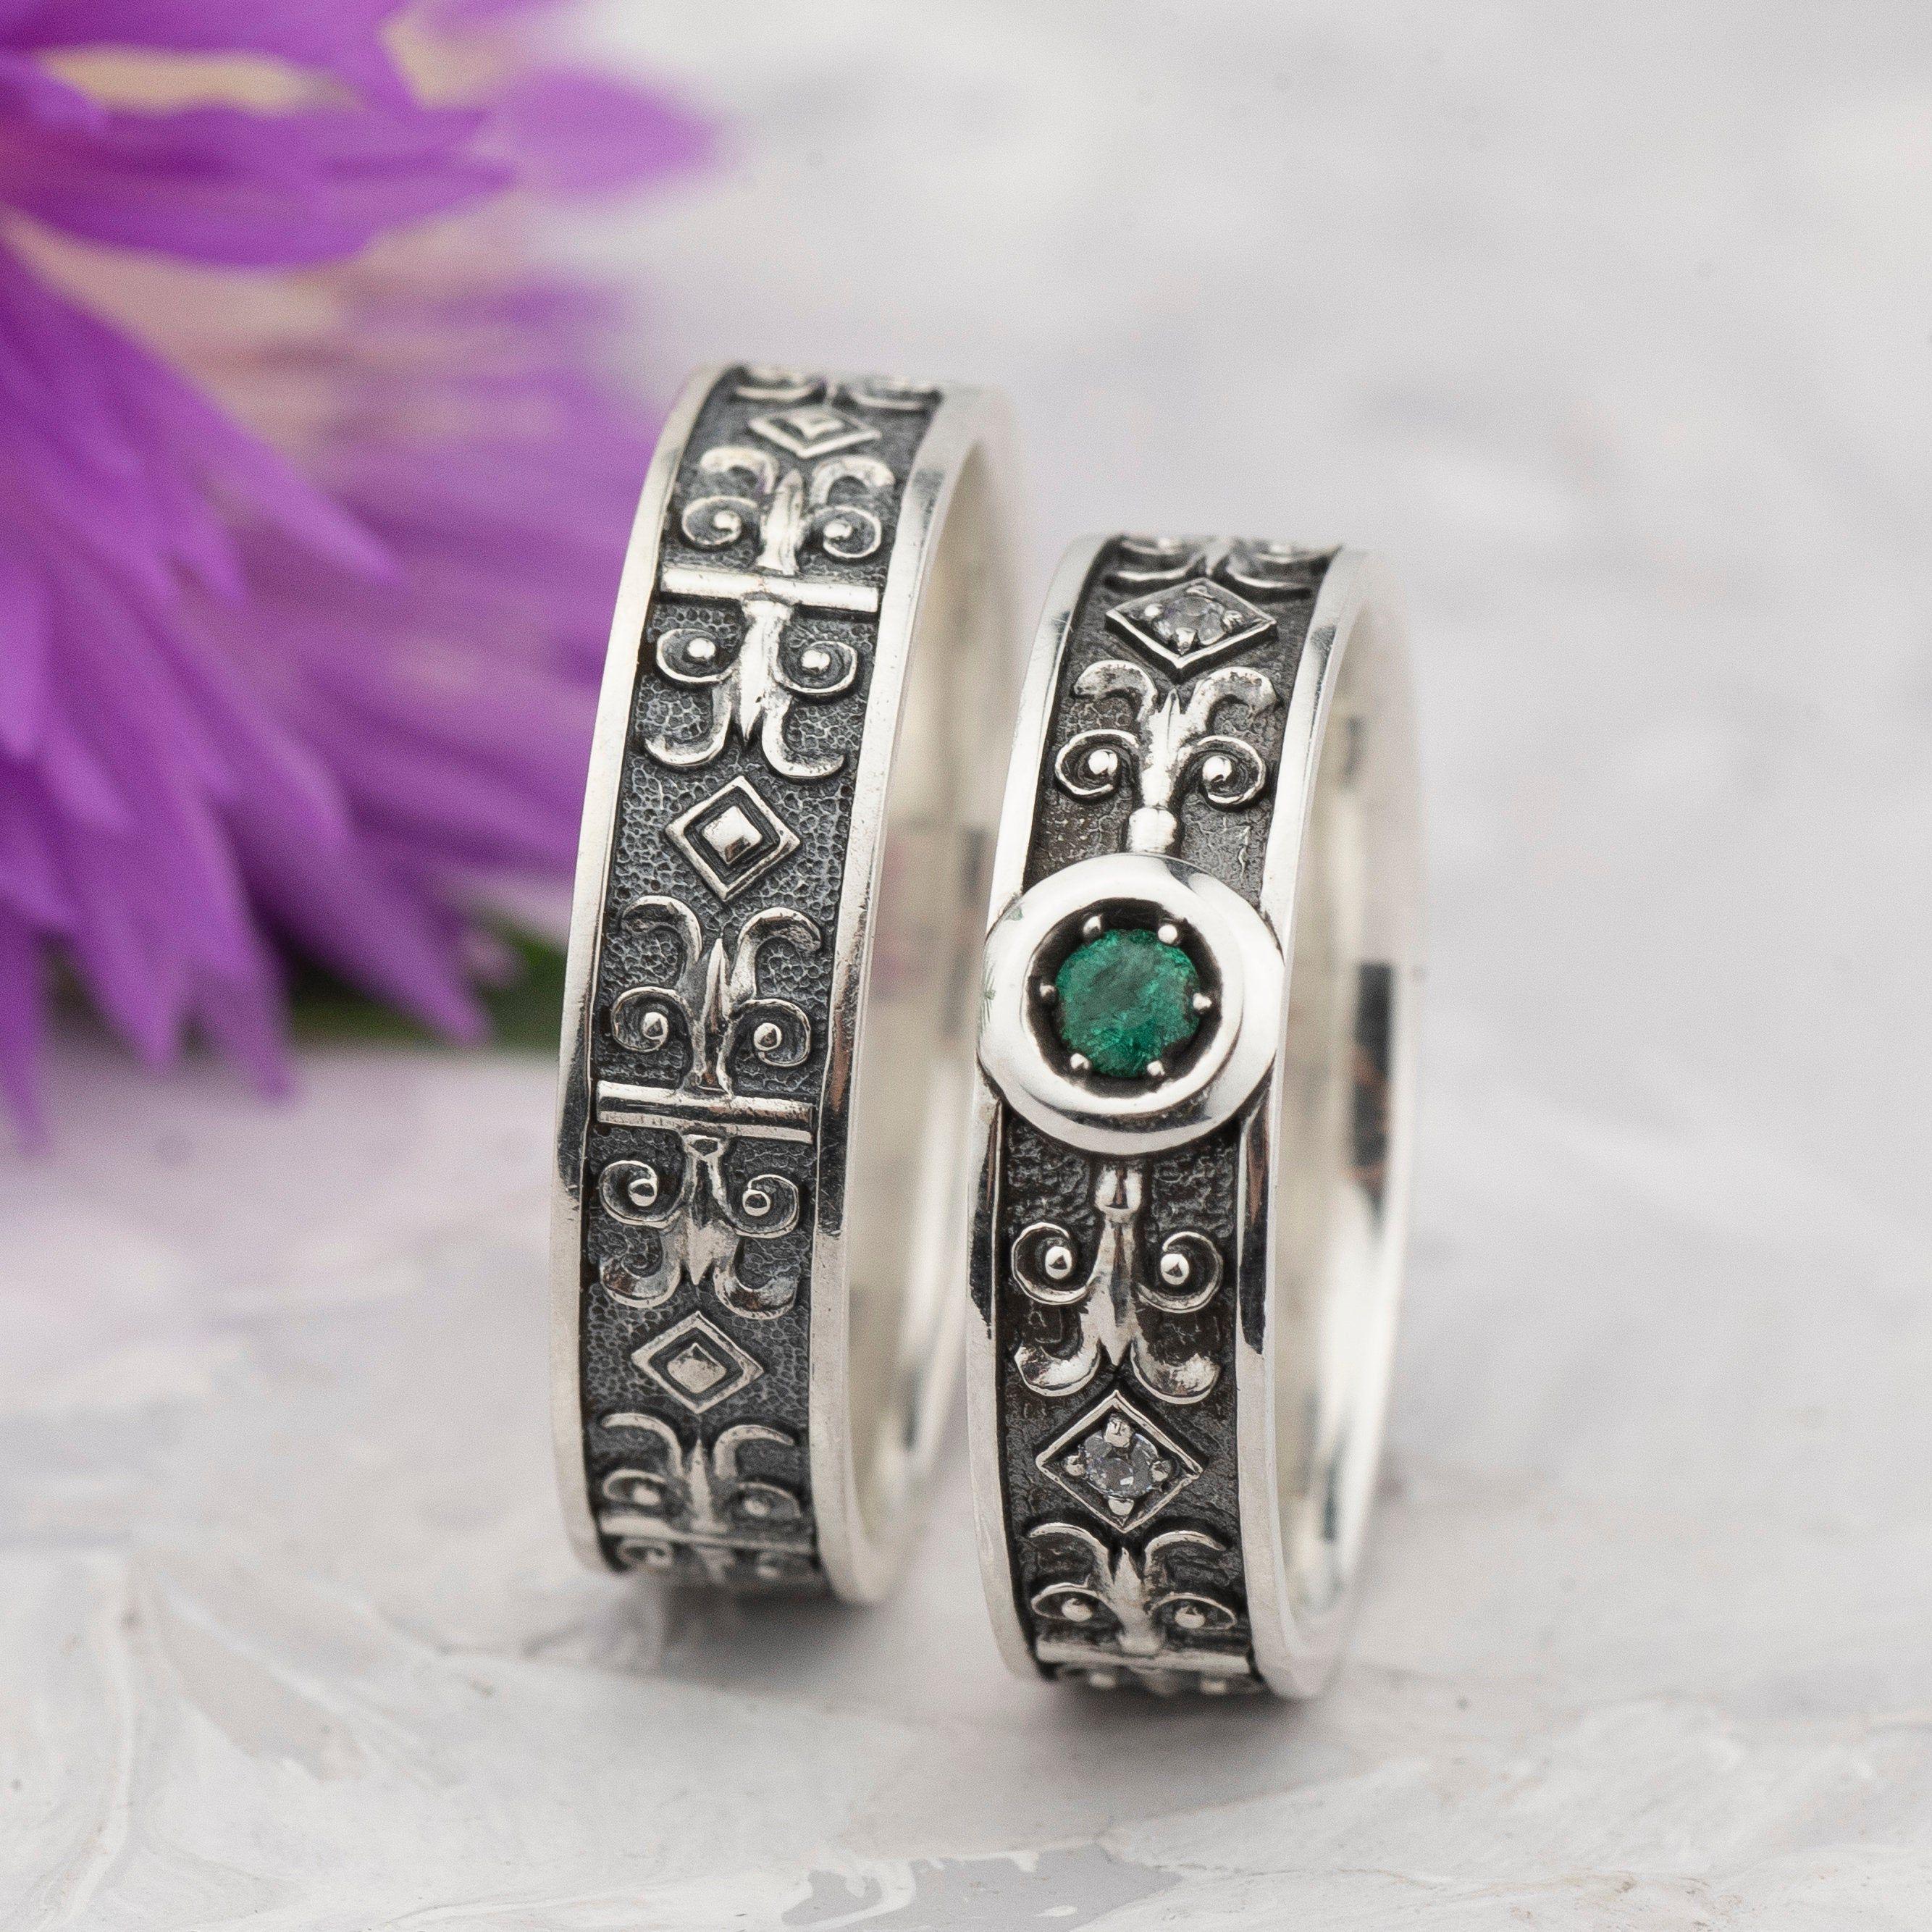 Natural Emerald Wedding Ring Set Unusual Wedding Ring Etsy Emerald Wedding Rings Set Unusual Wedding Rings Emerald Wedding Rings